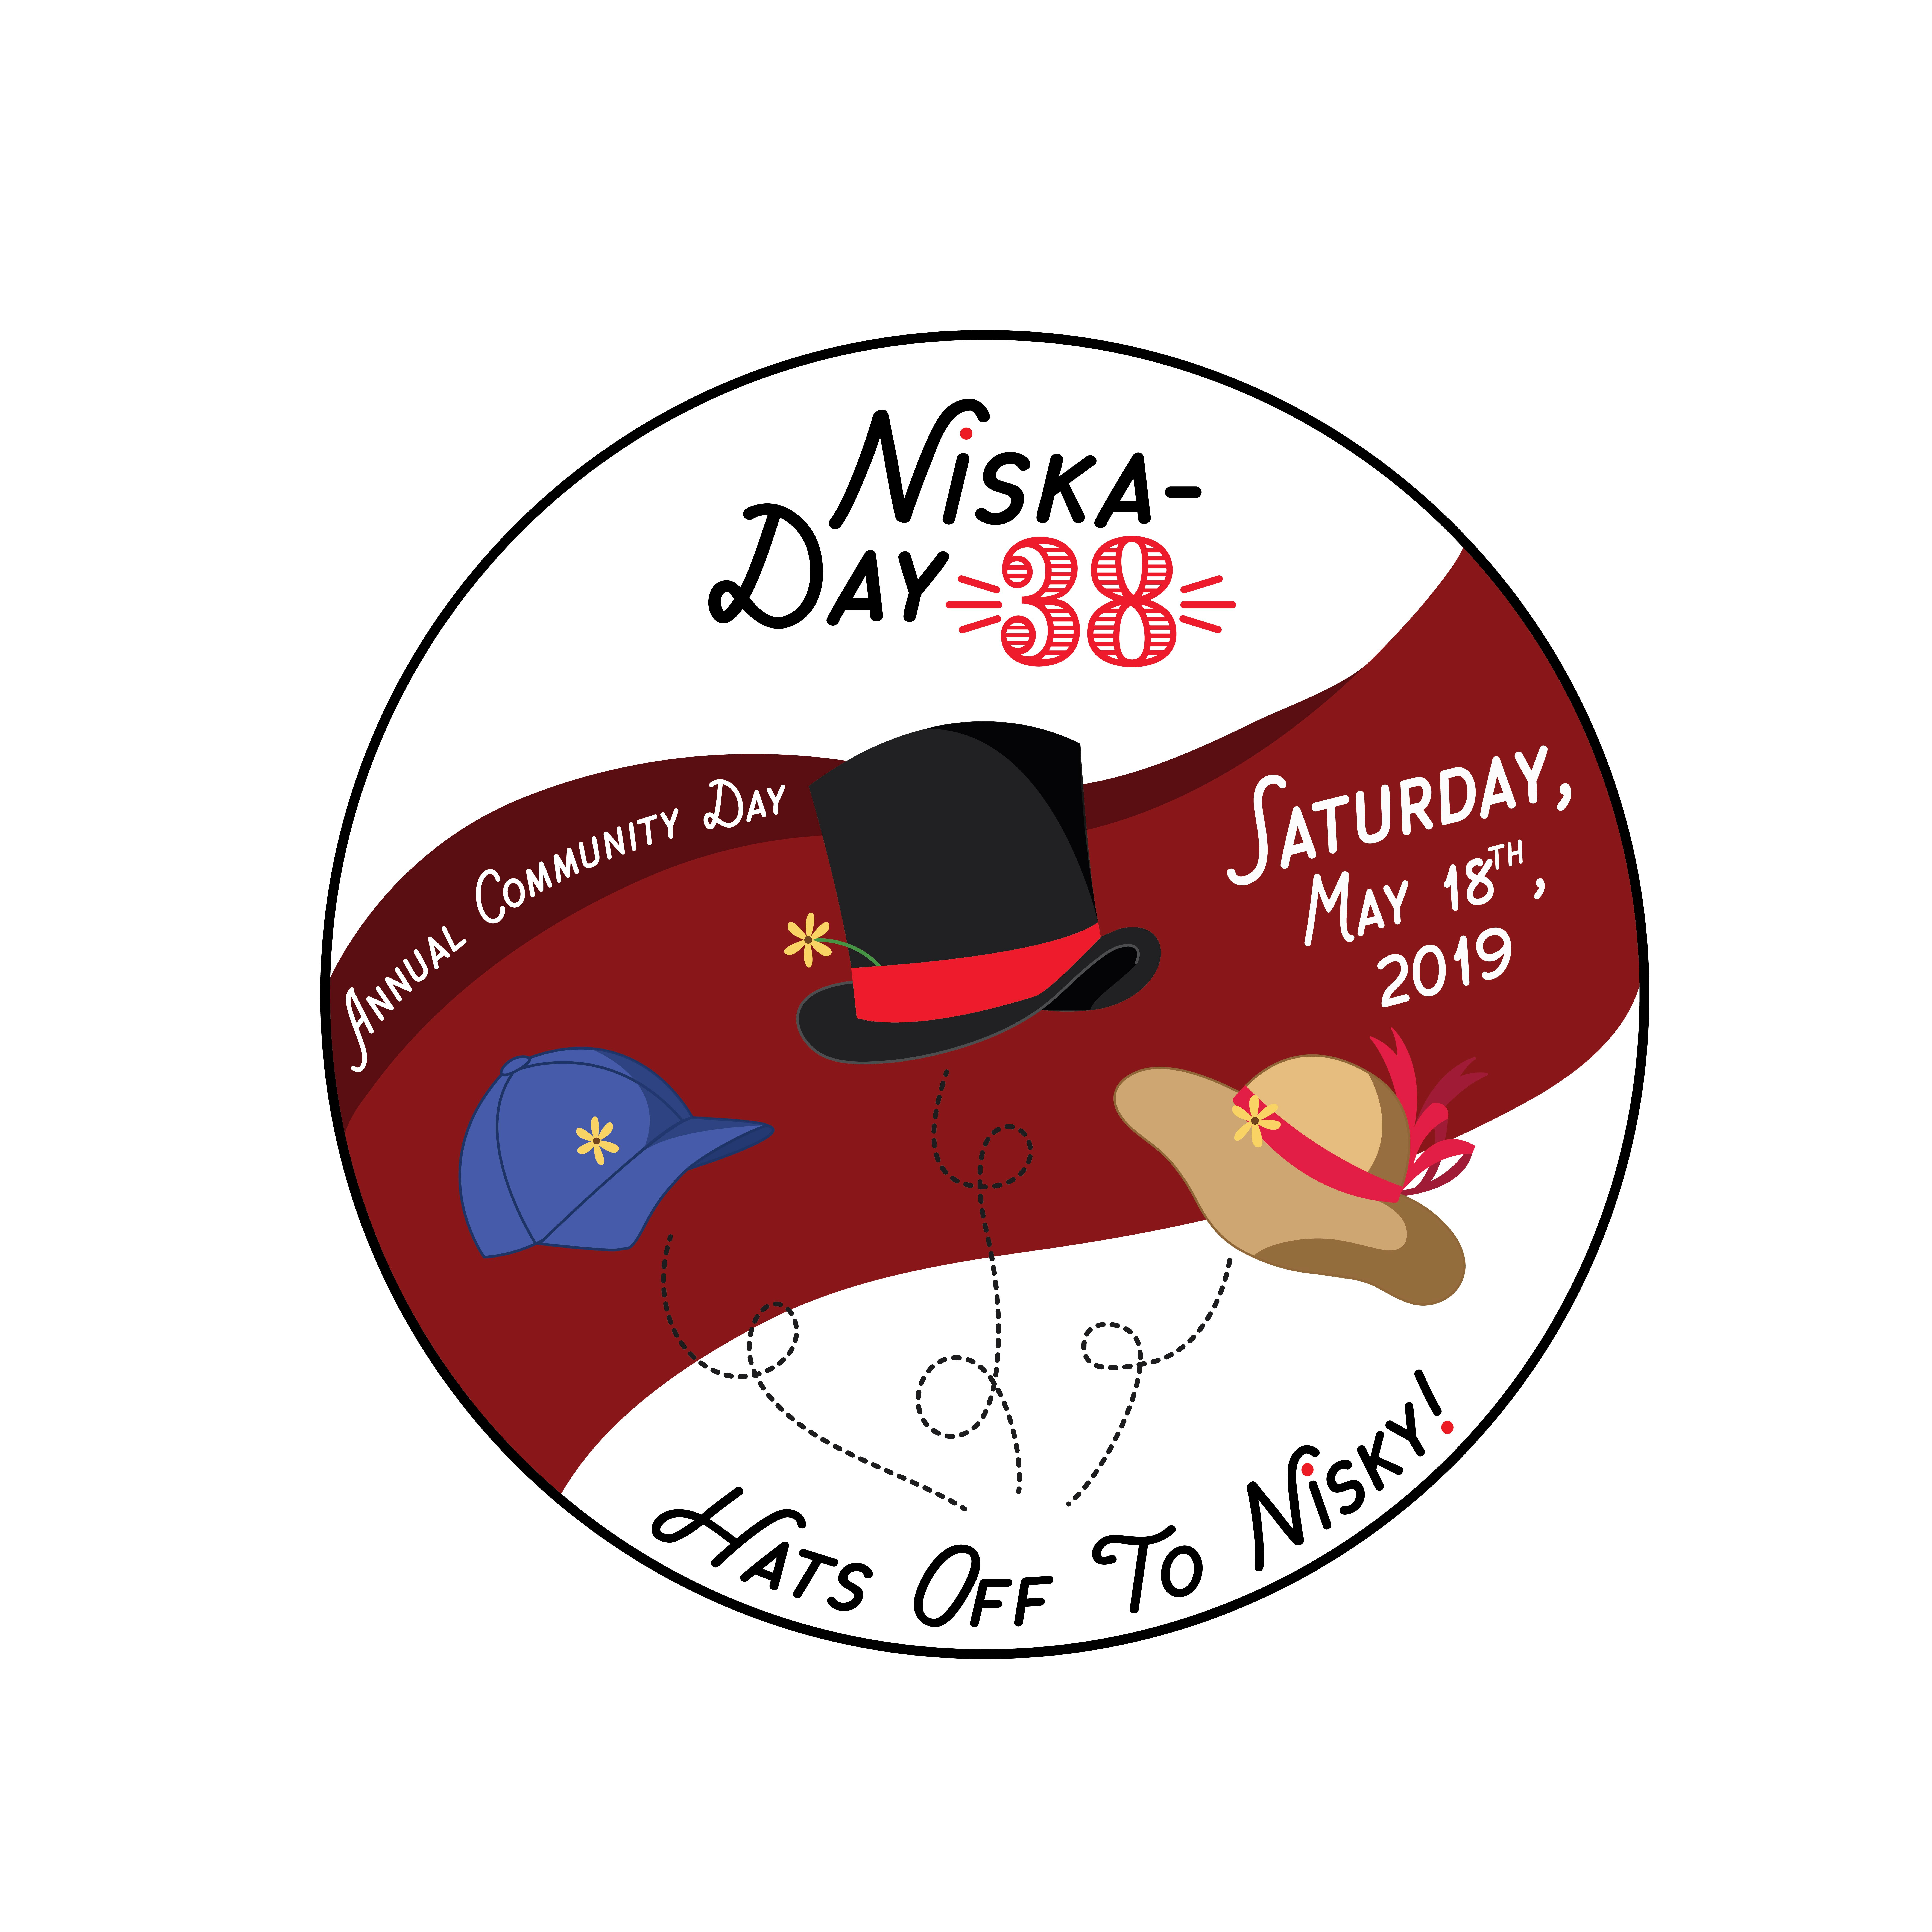 Mark Your Calendar for NiskaDay 38 - Saturday, May 18, 2019!